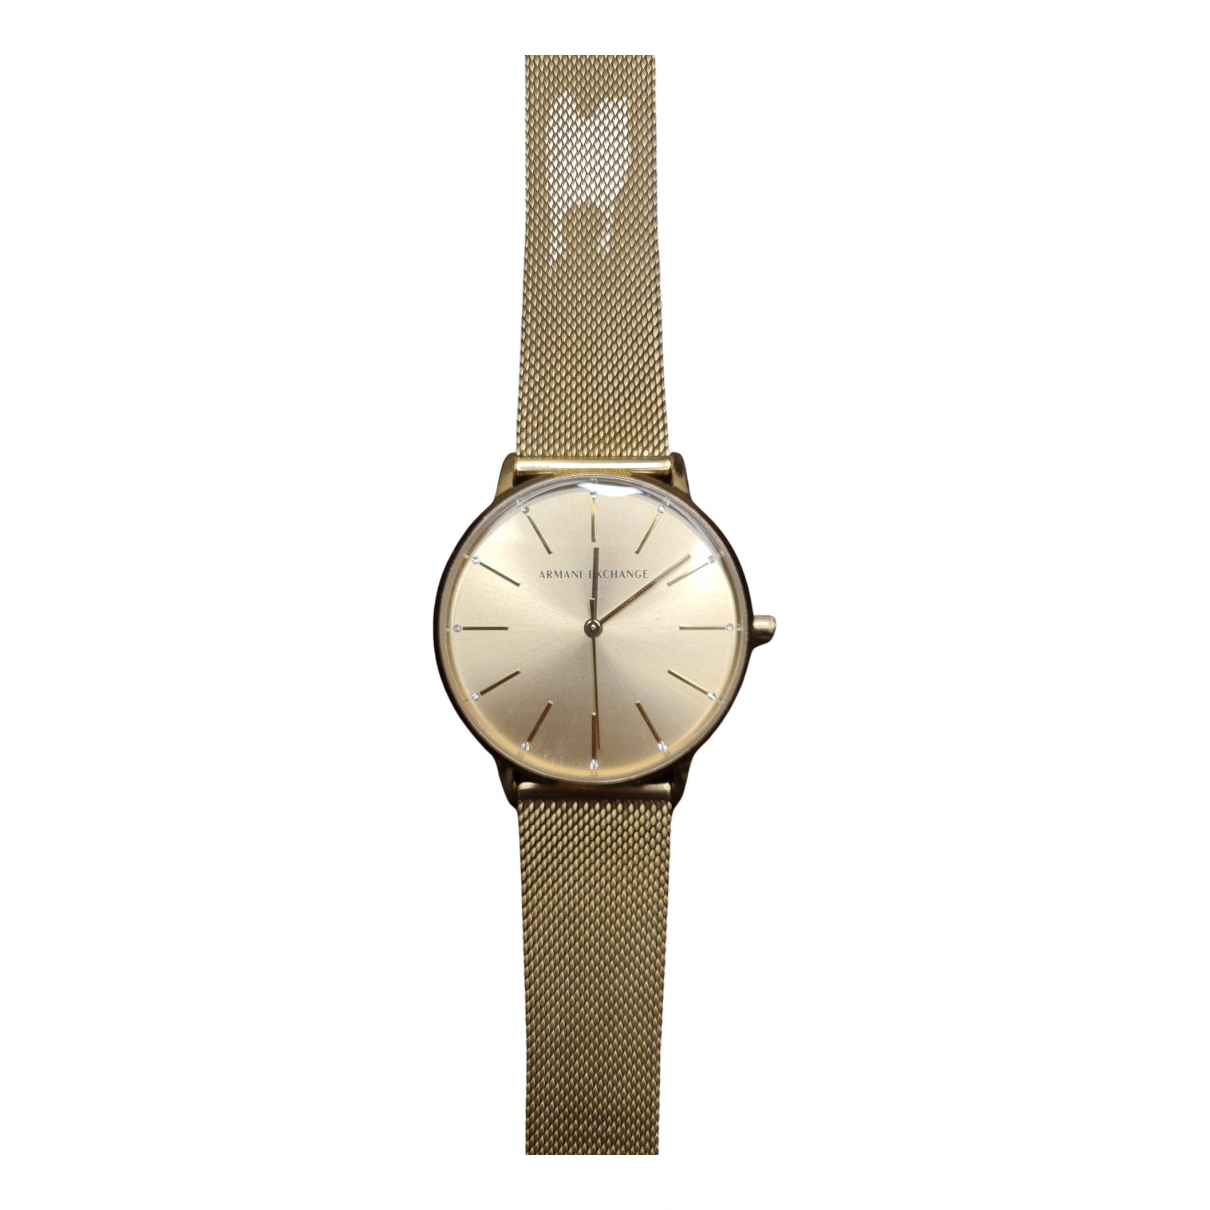 Emporio Armani \N Uhr in  Gold Stahl